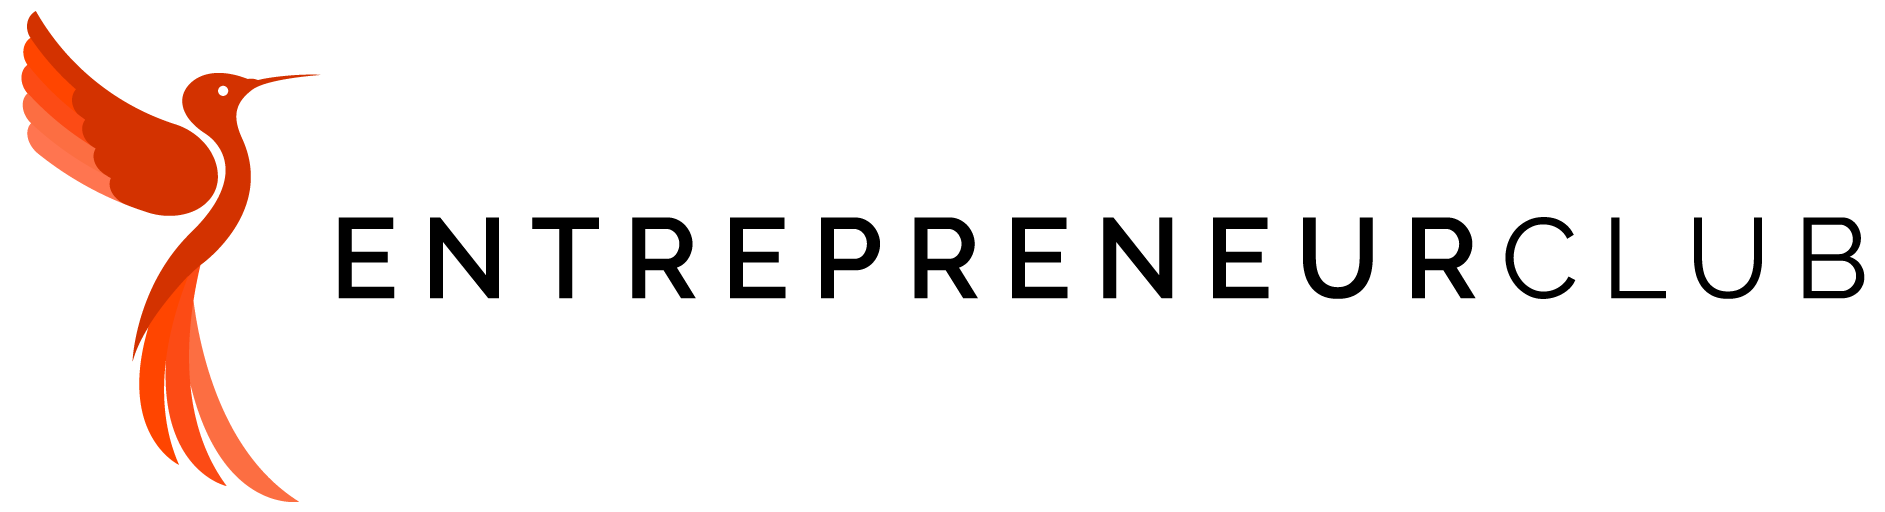 EPFL Entrepreneur Club logo